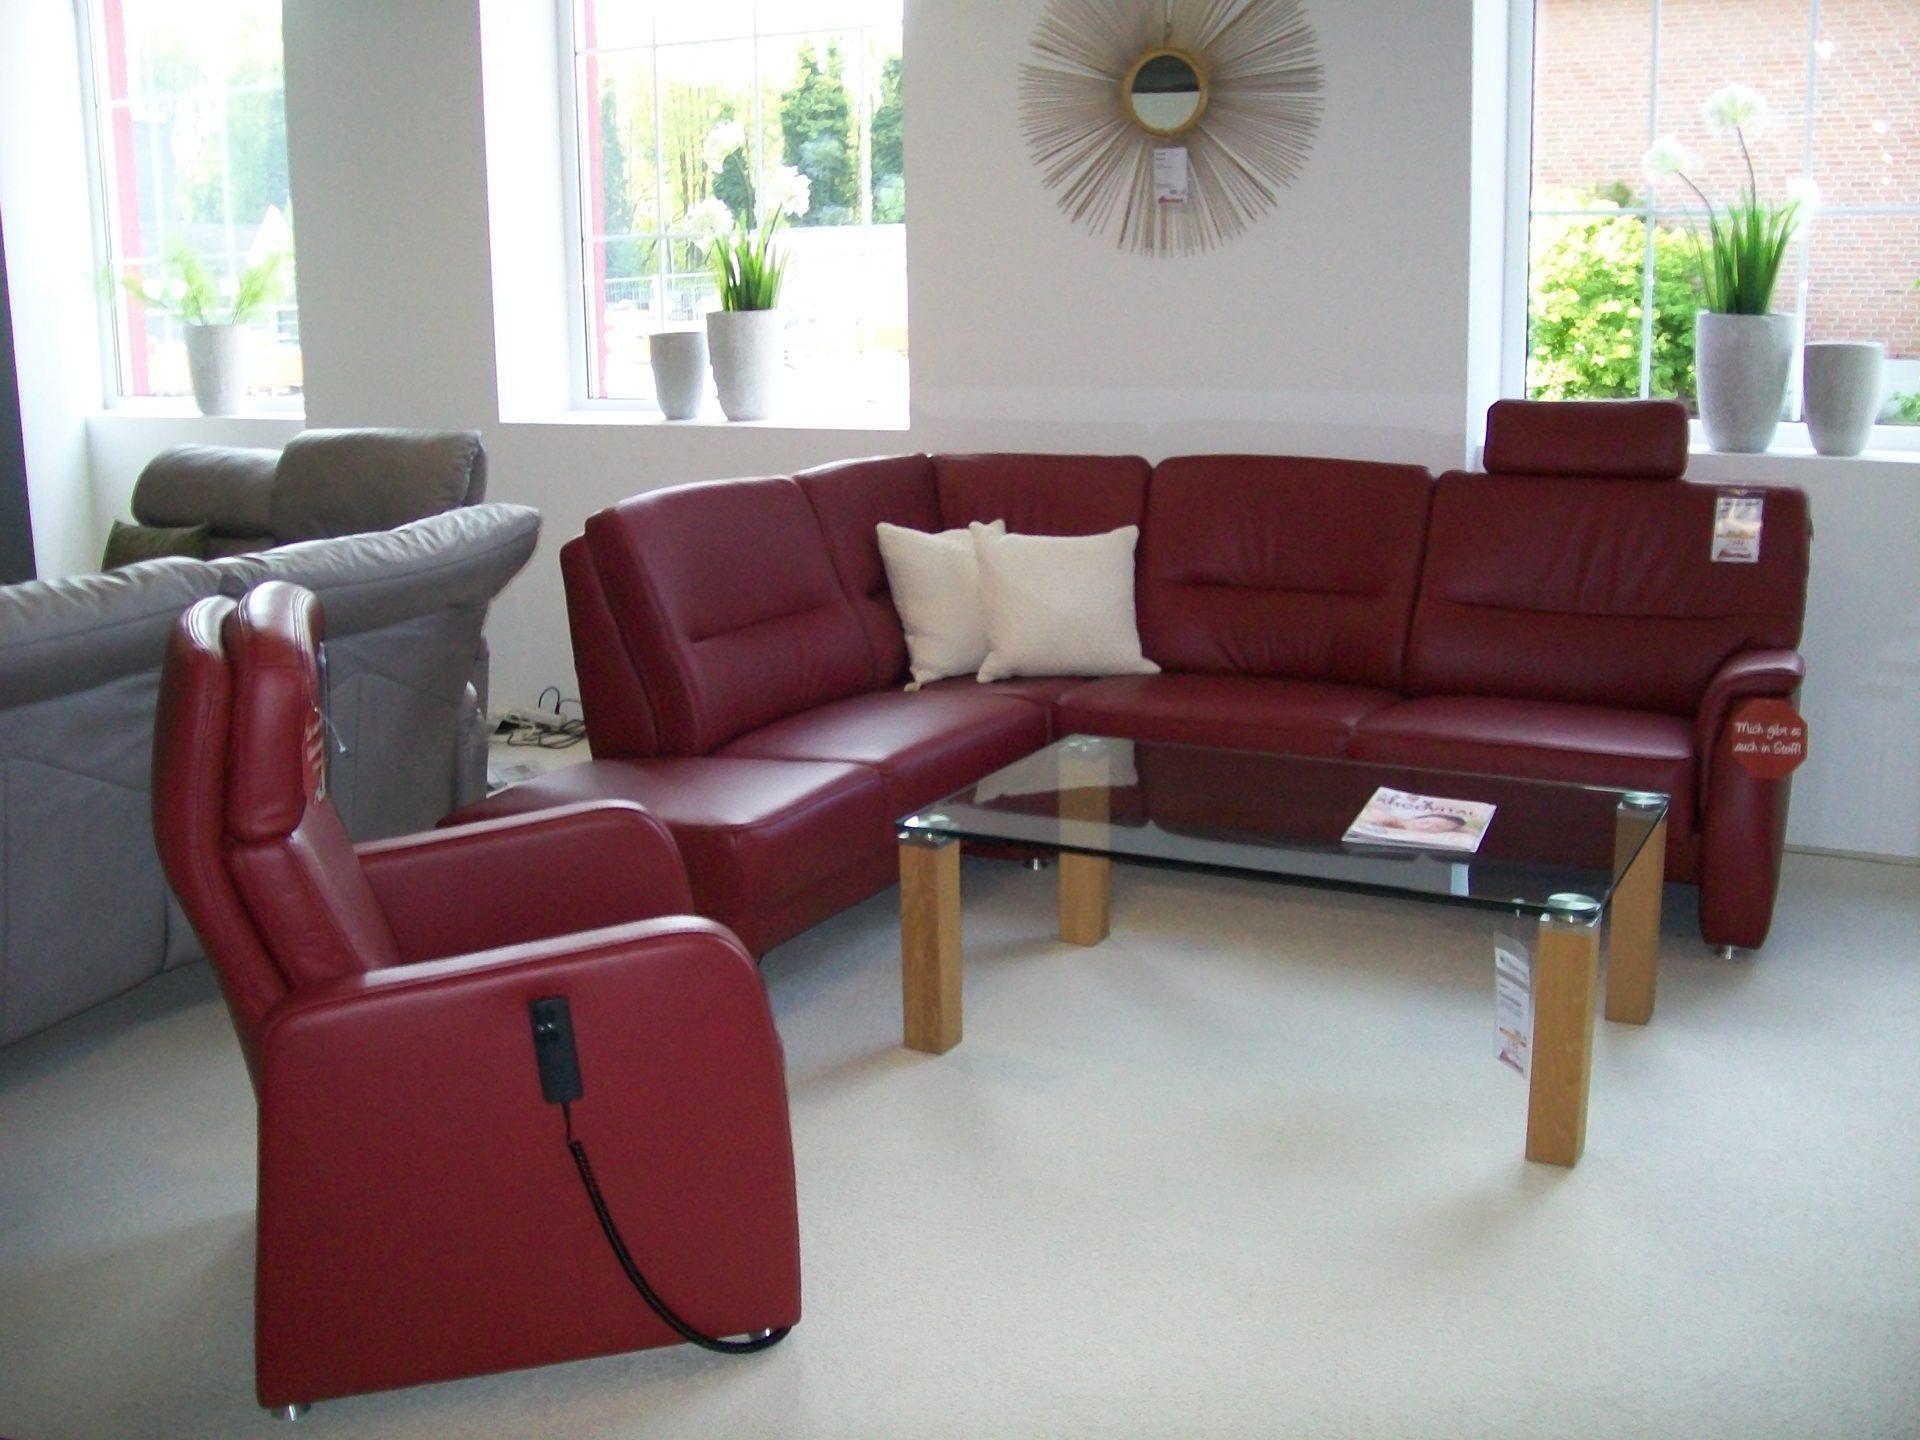 Wohnzimmer Bordeaux Latest Paar Stck Teppich Rose Farbe Bordeaux